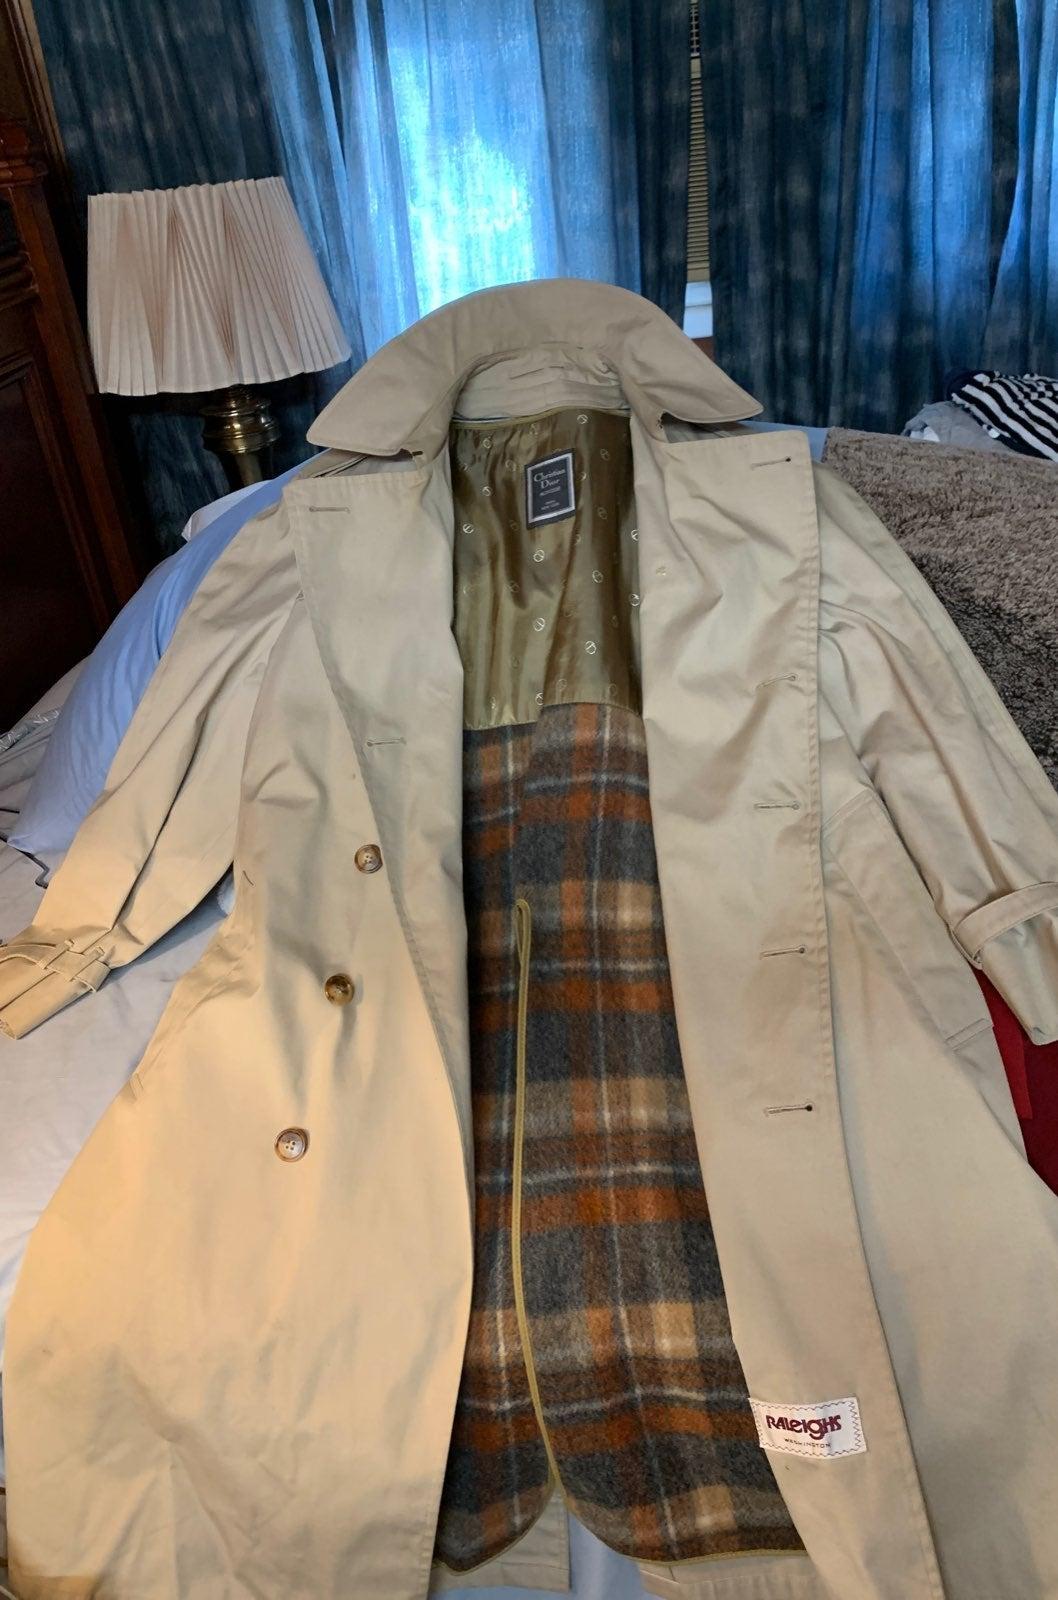 Christian Dior Trench Coat for Men